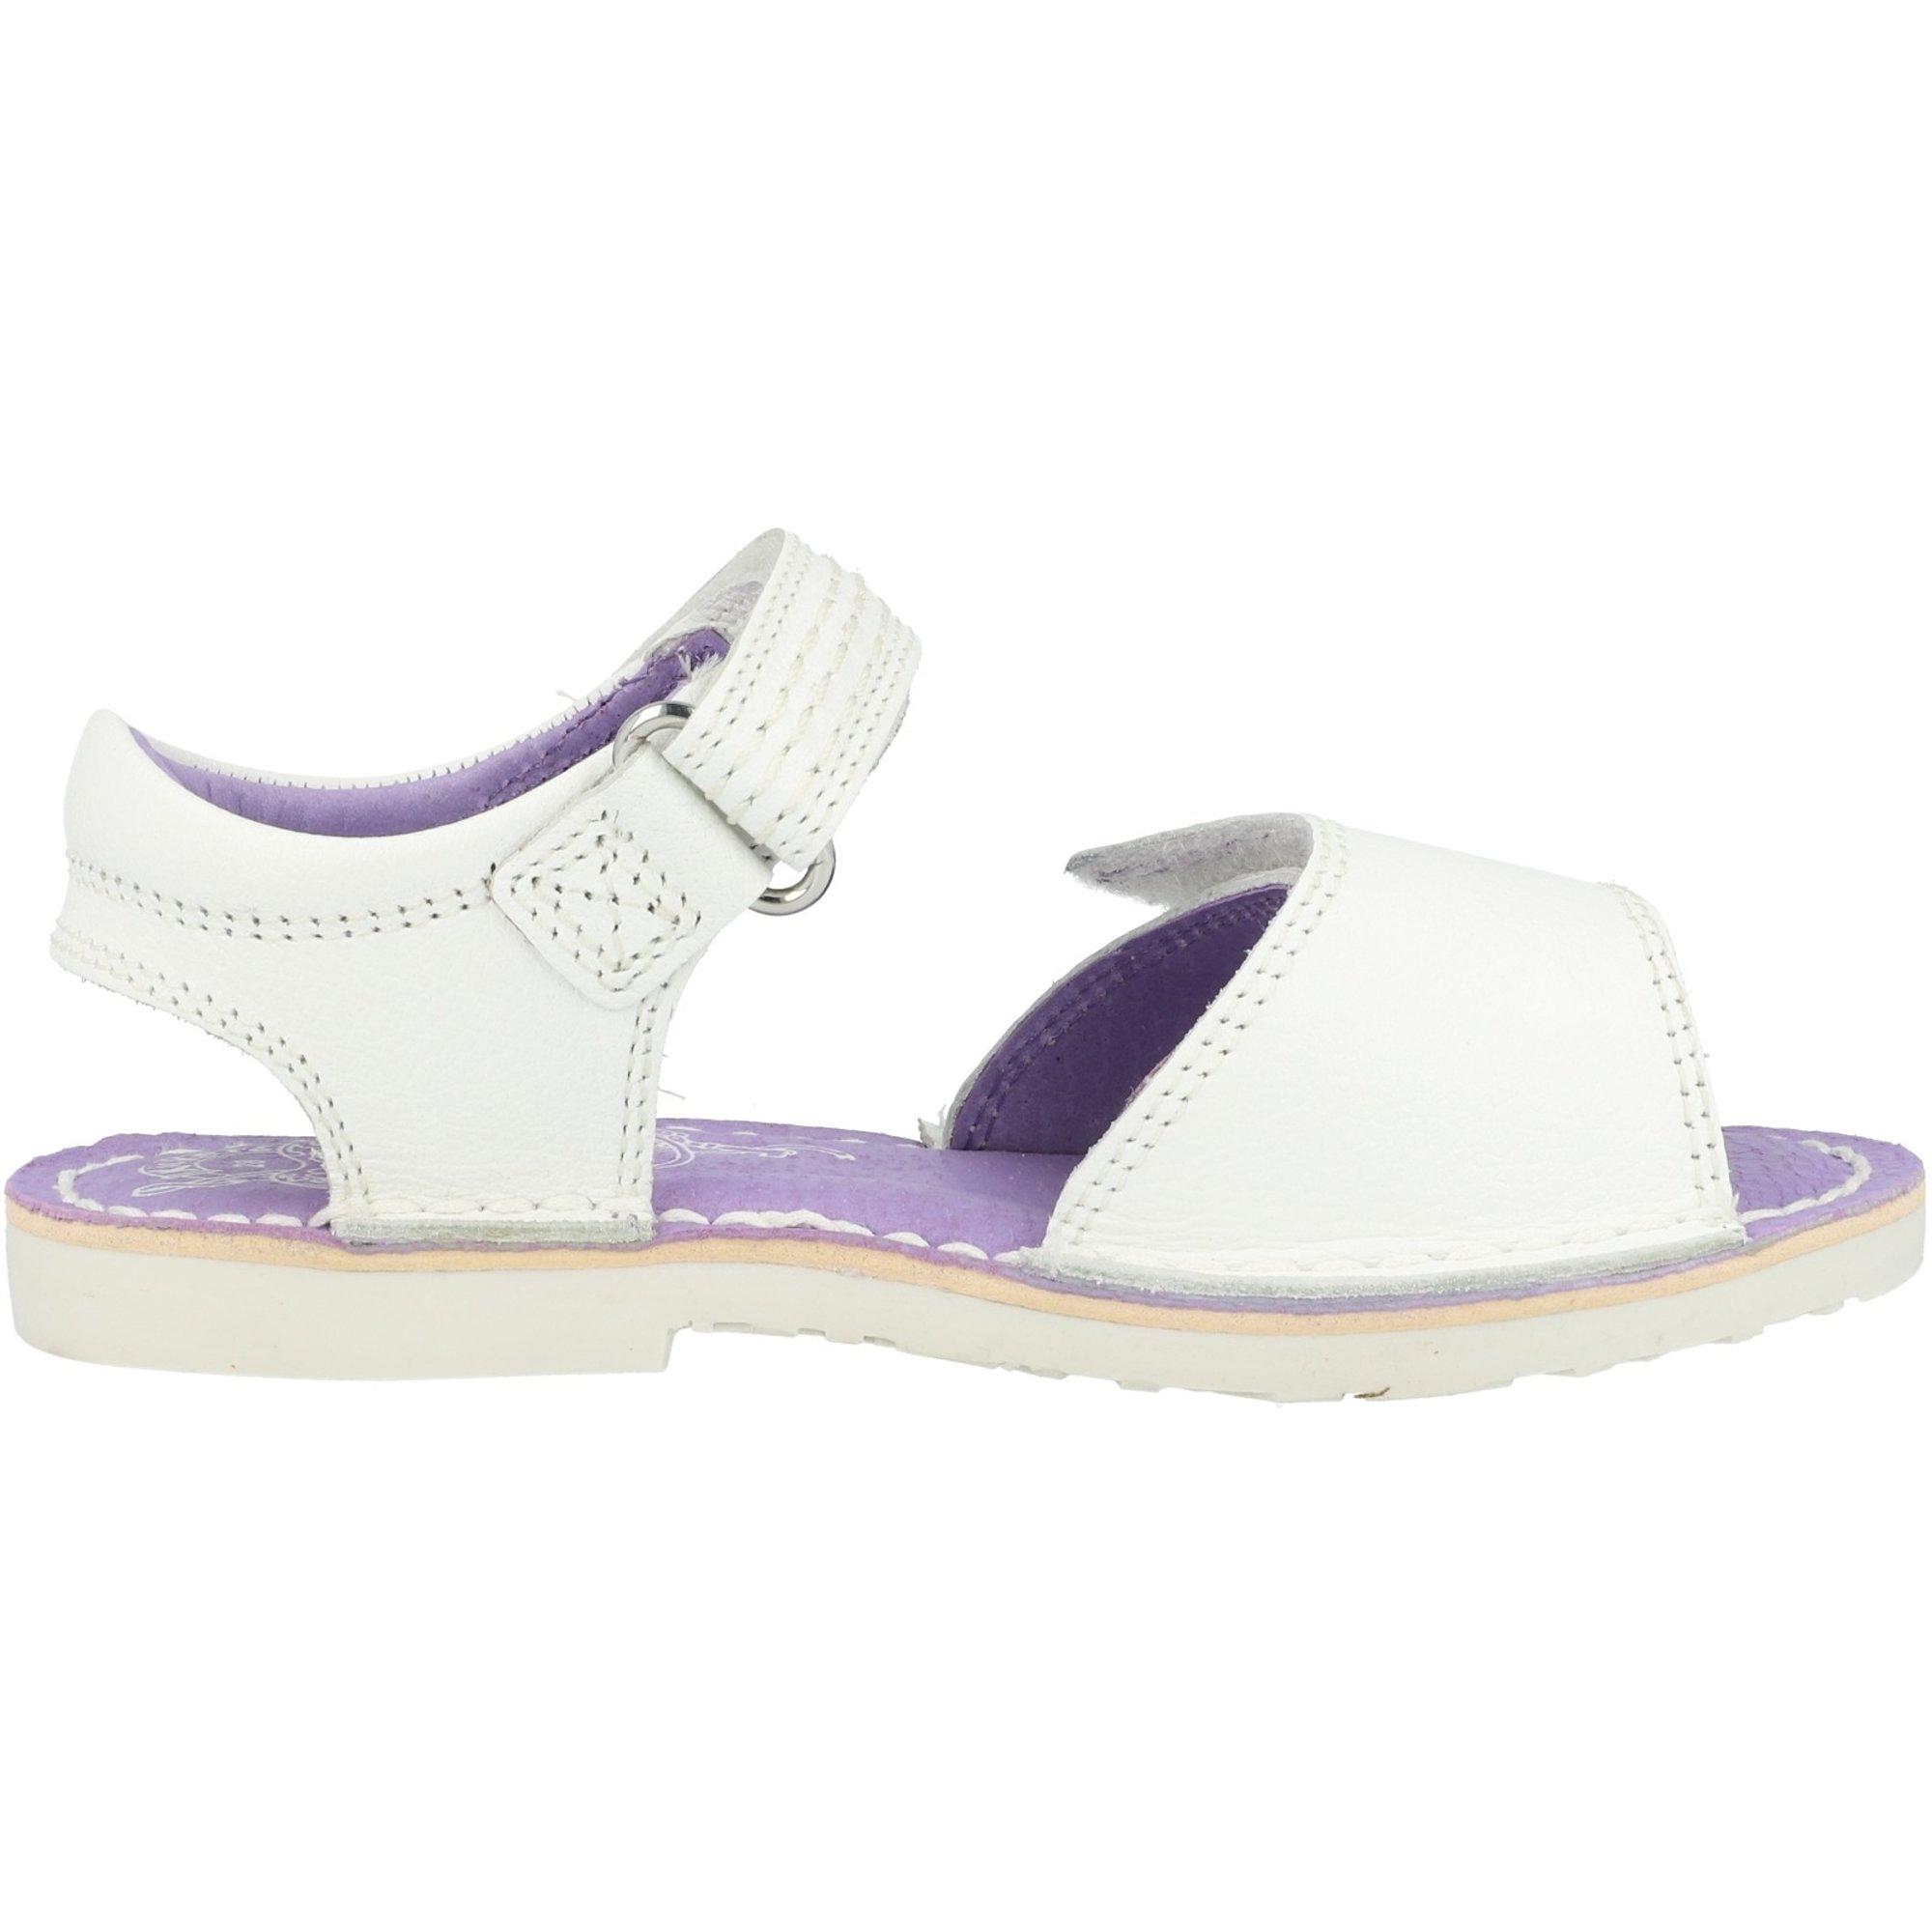 Adlar kickers adlar sandal i white leather infant